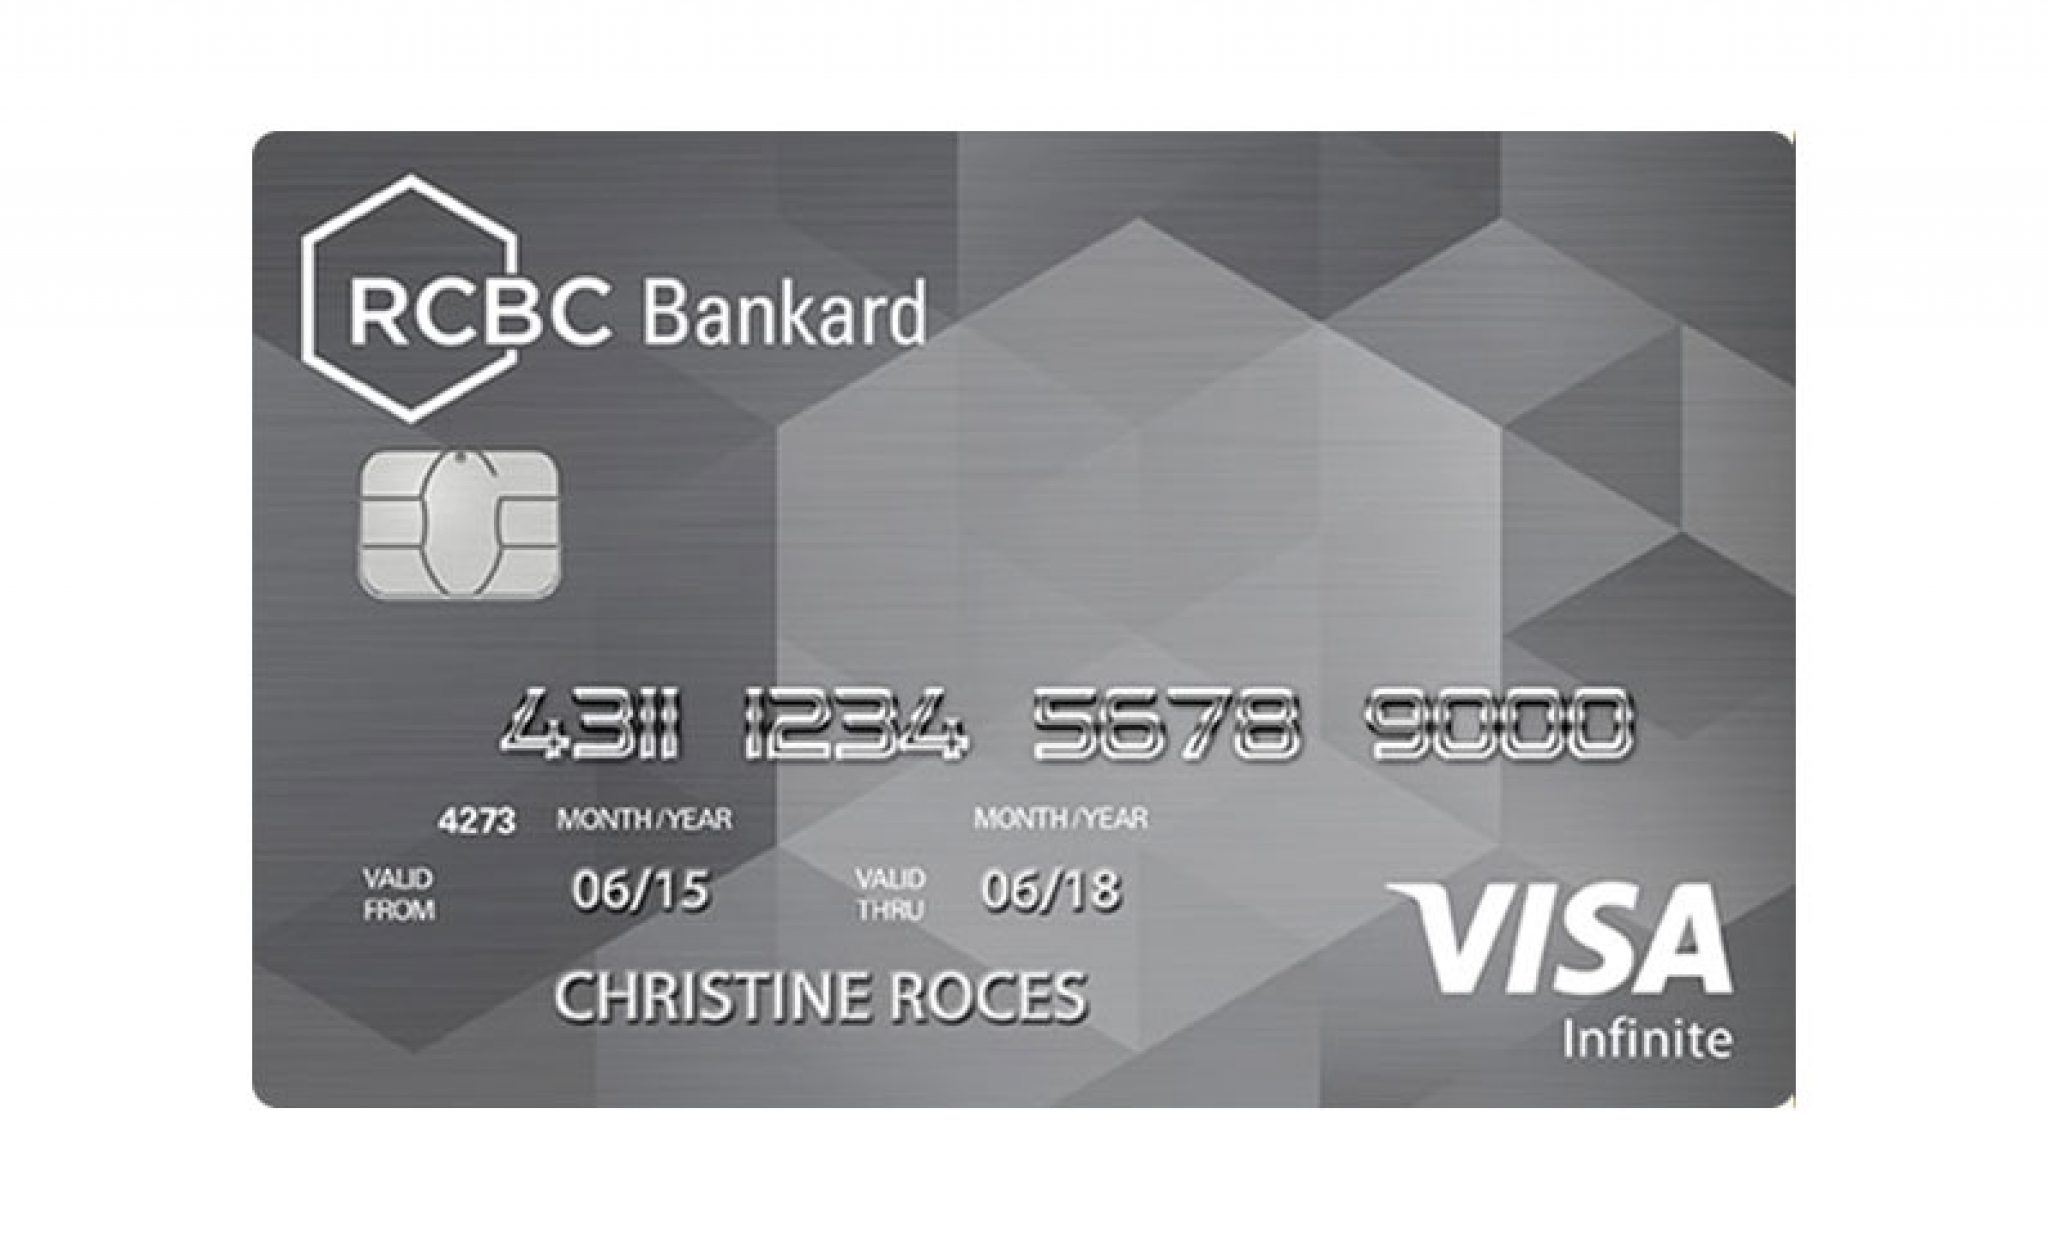 RCBC Bankard Infinite Visa